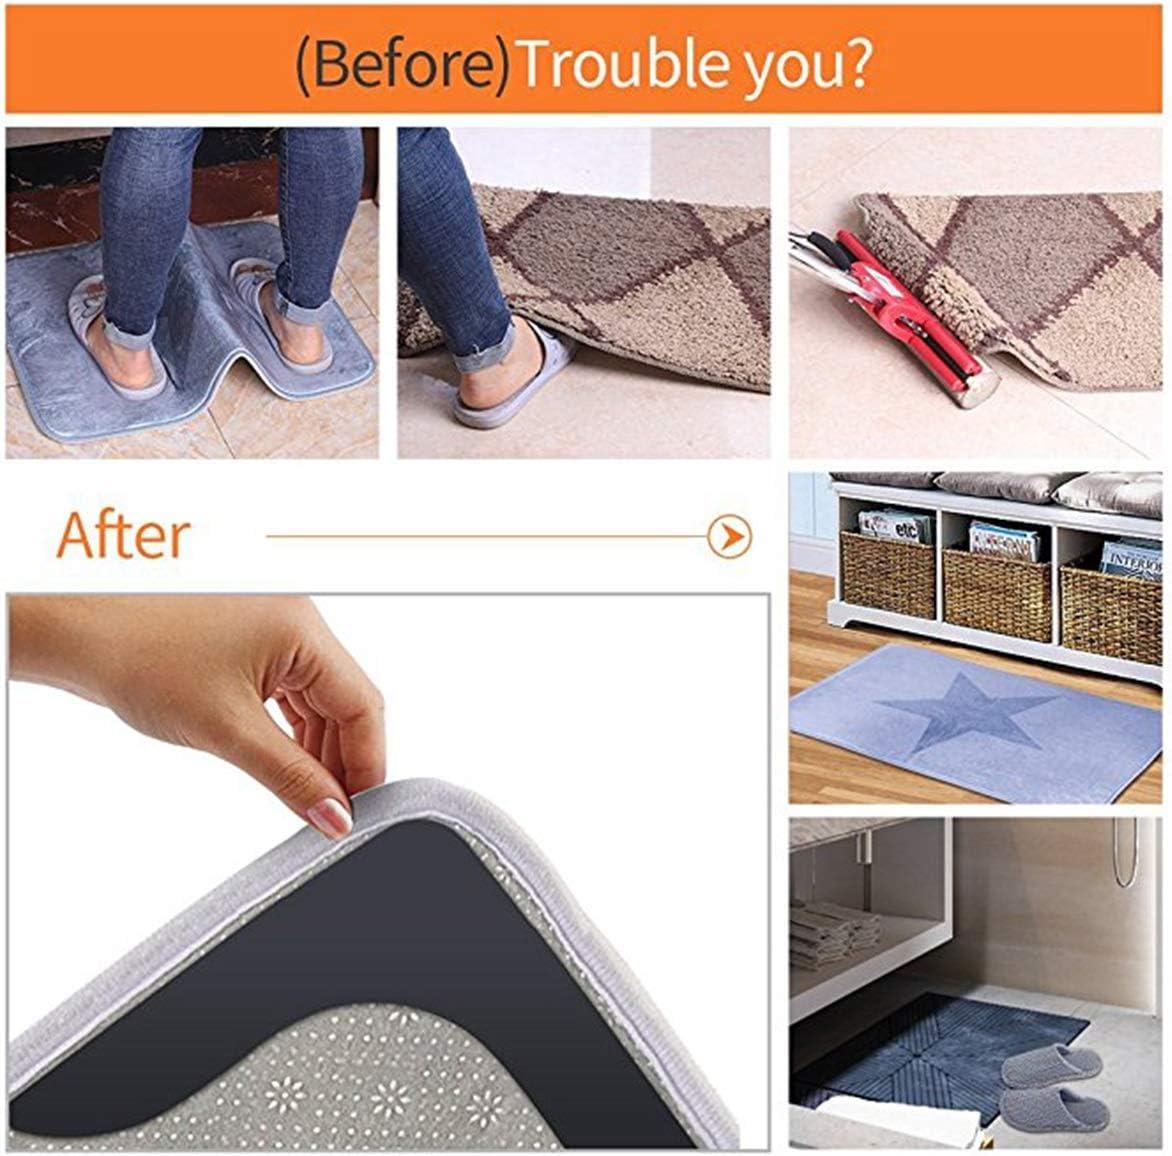 Yuniroom Rug Gripper,4//8pcs Floor Rug Carpet Mat Gripper Non Slip Anti Slip White Black Rug Gripper for Wooden Floors Carpet Sticker Anti Slip Rug Underlay to Keep Your Rug in Places